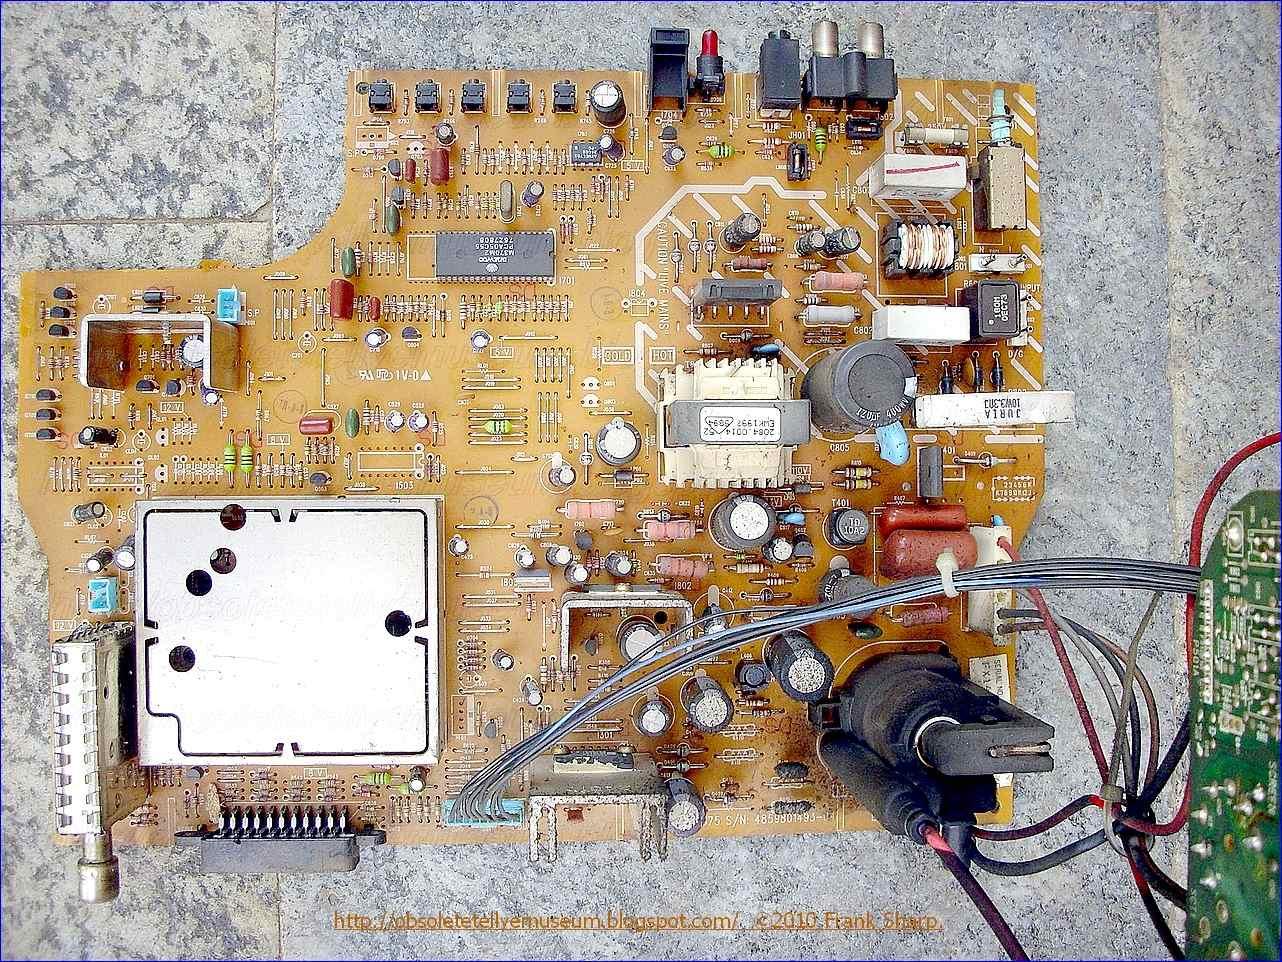 Obsolete Technology Tellye Panasonic Tc 14b3rc Chassis Z 375 Pushpull Converter Circuit Diagram Composed Of Tda4718 Basic General Description